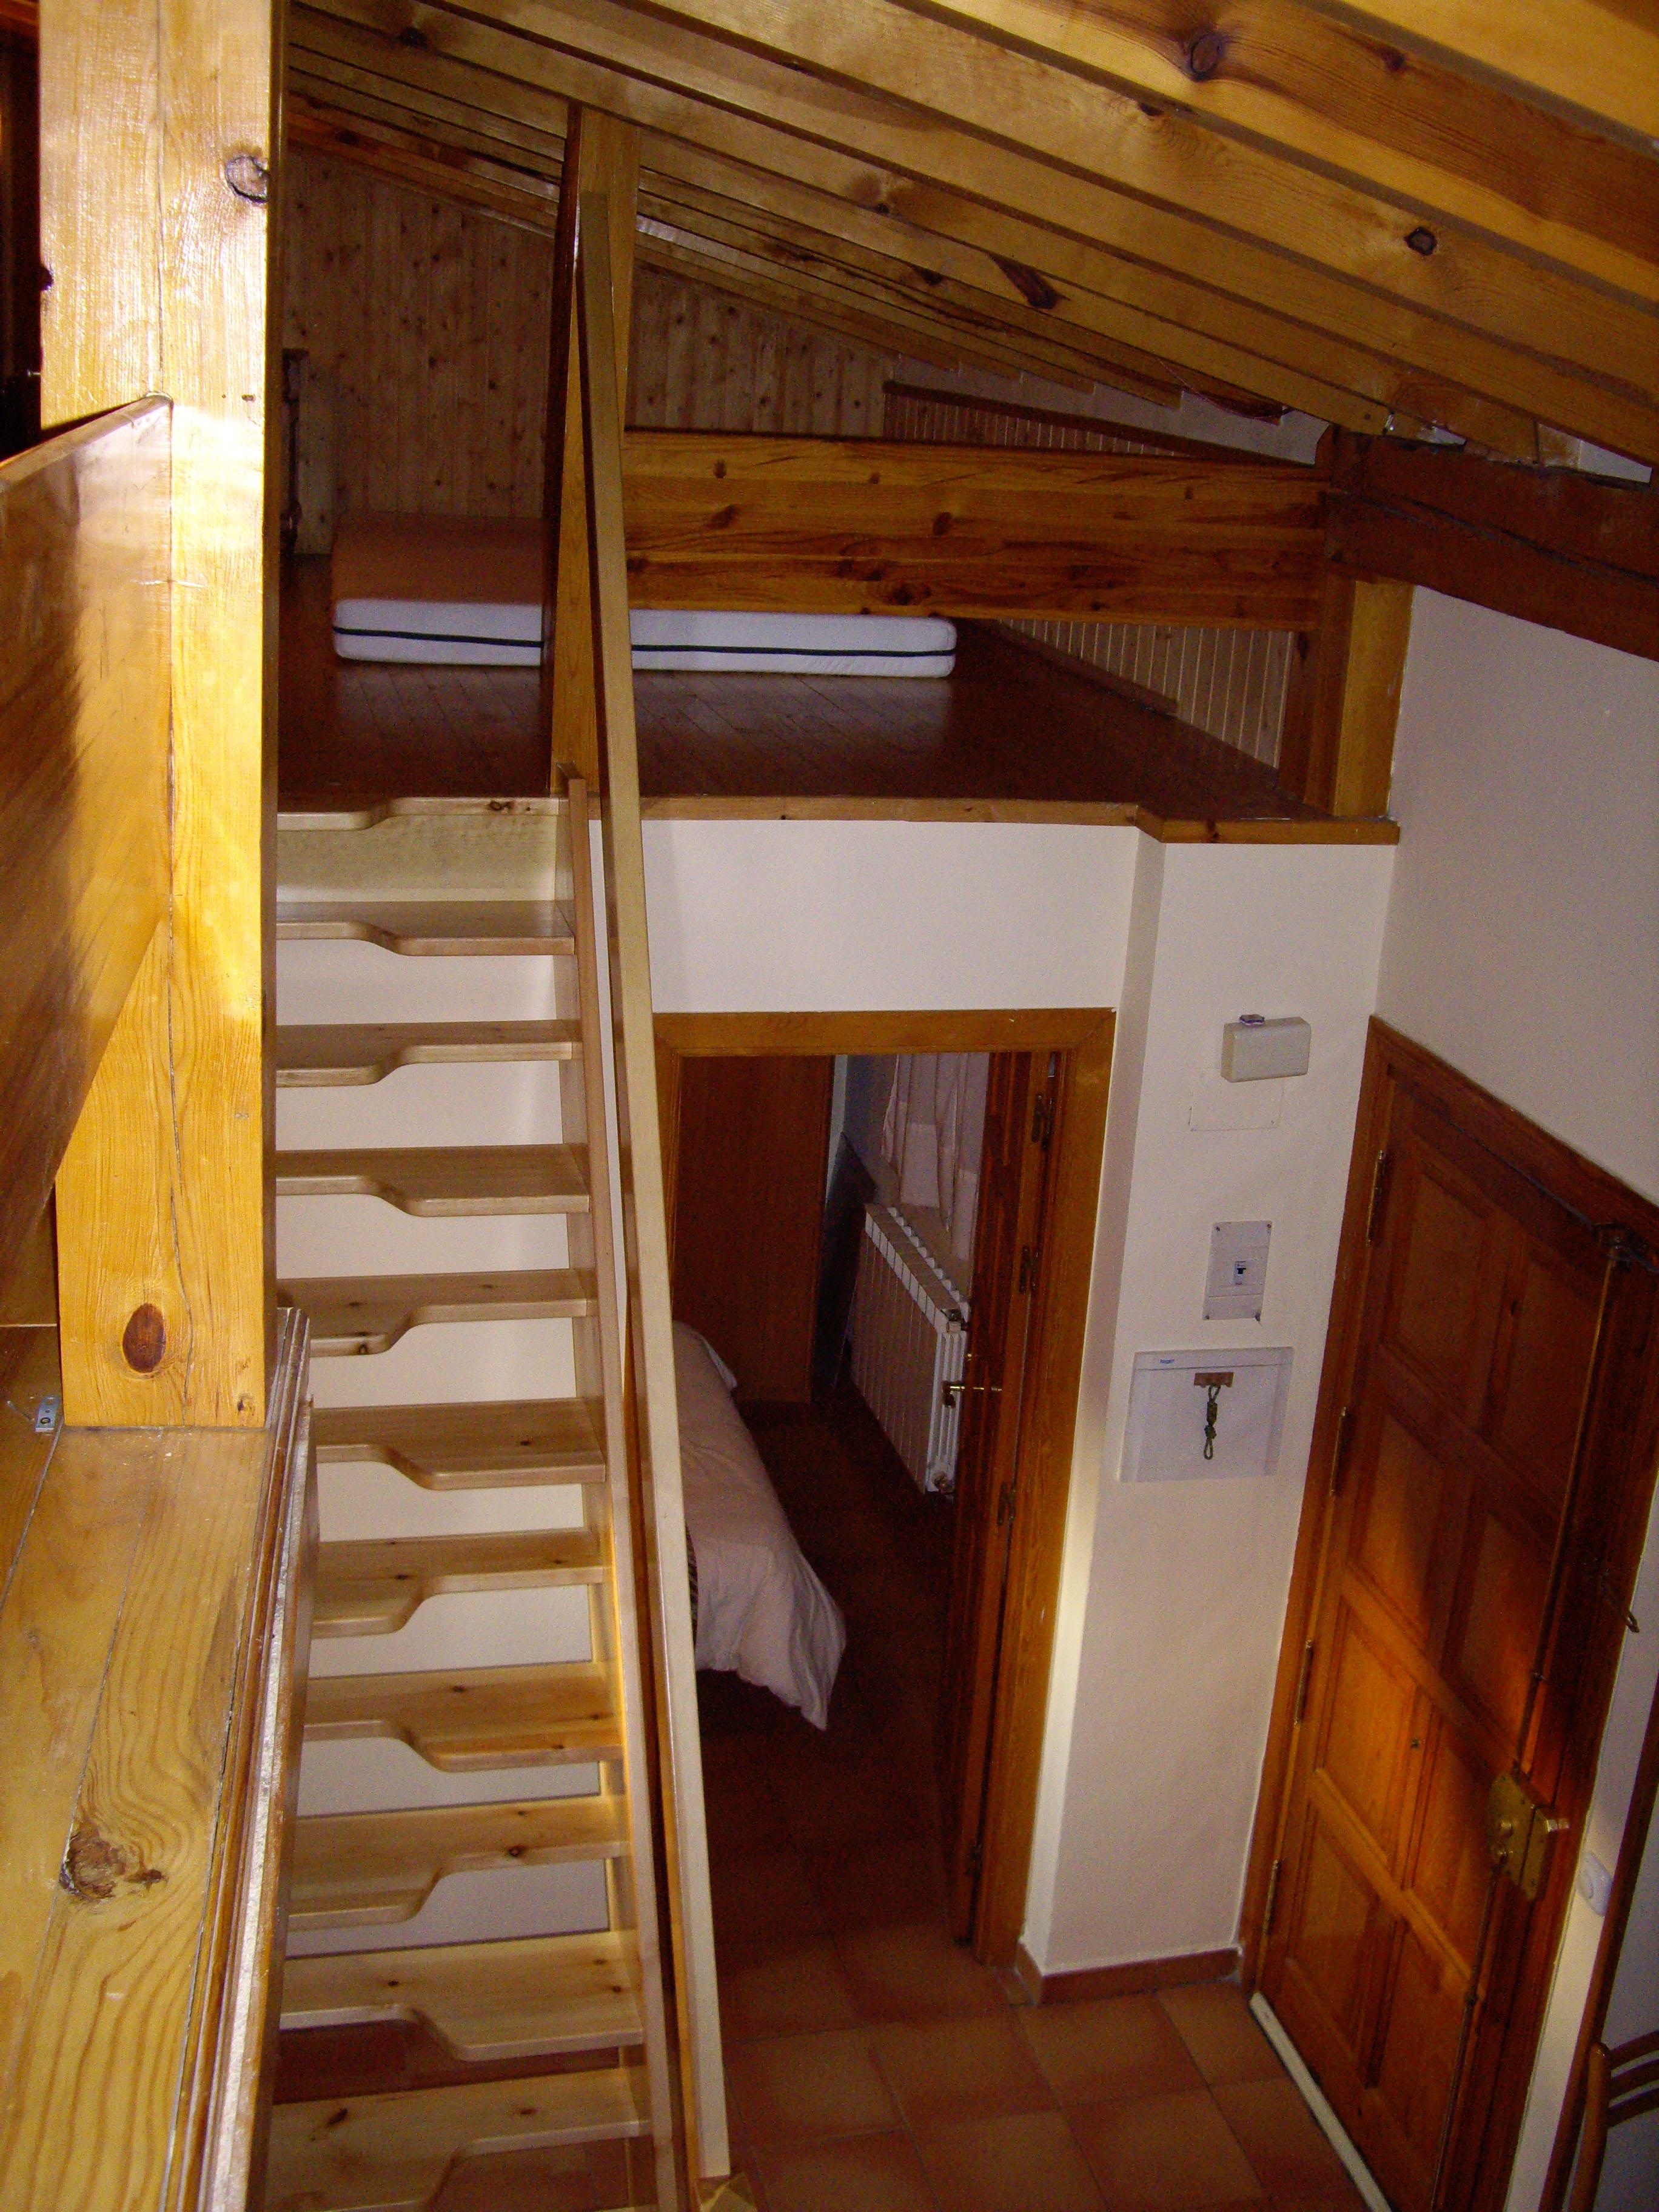 Escaleras espacios reducidos escalera para espacios de madera escalera escalera de pie - Escaleras espacios reducidos ...